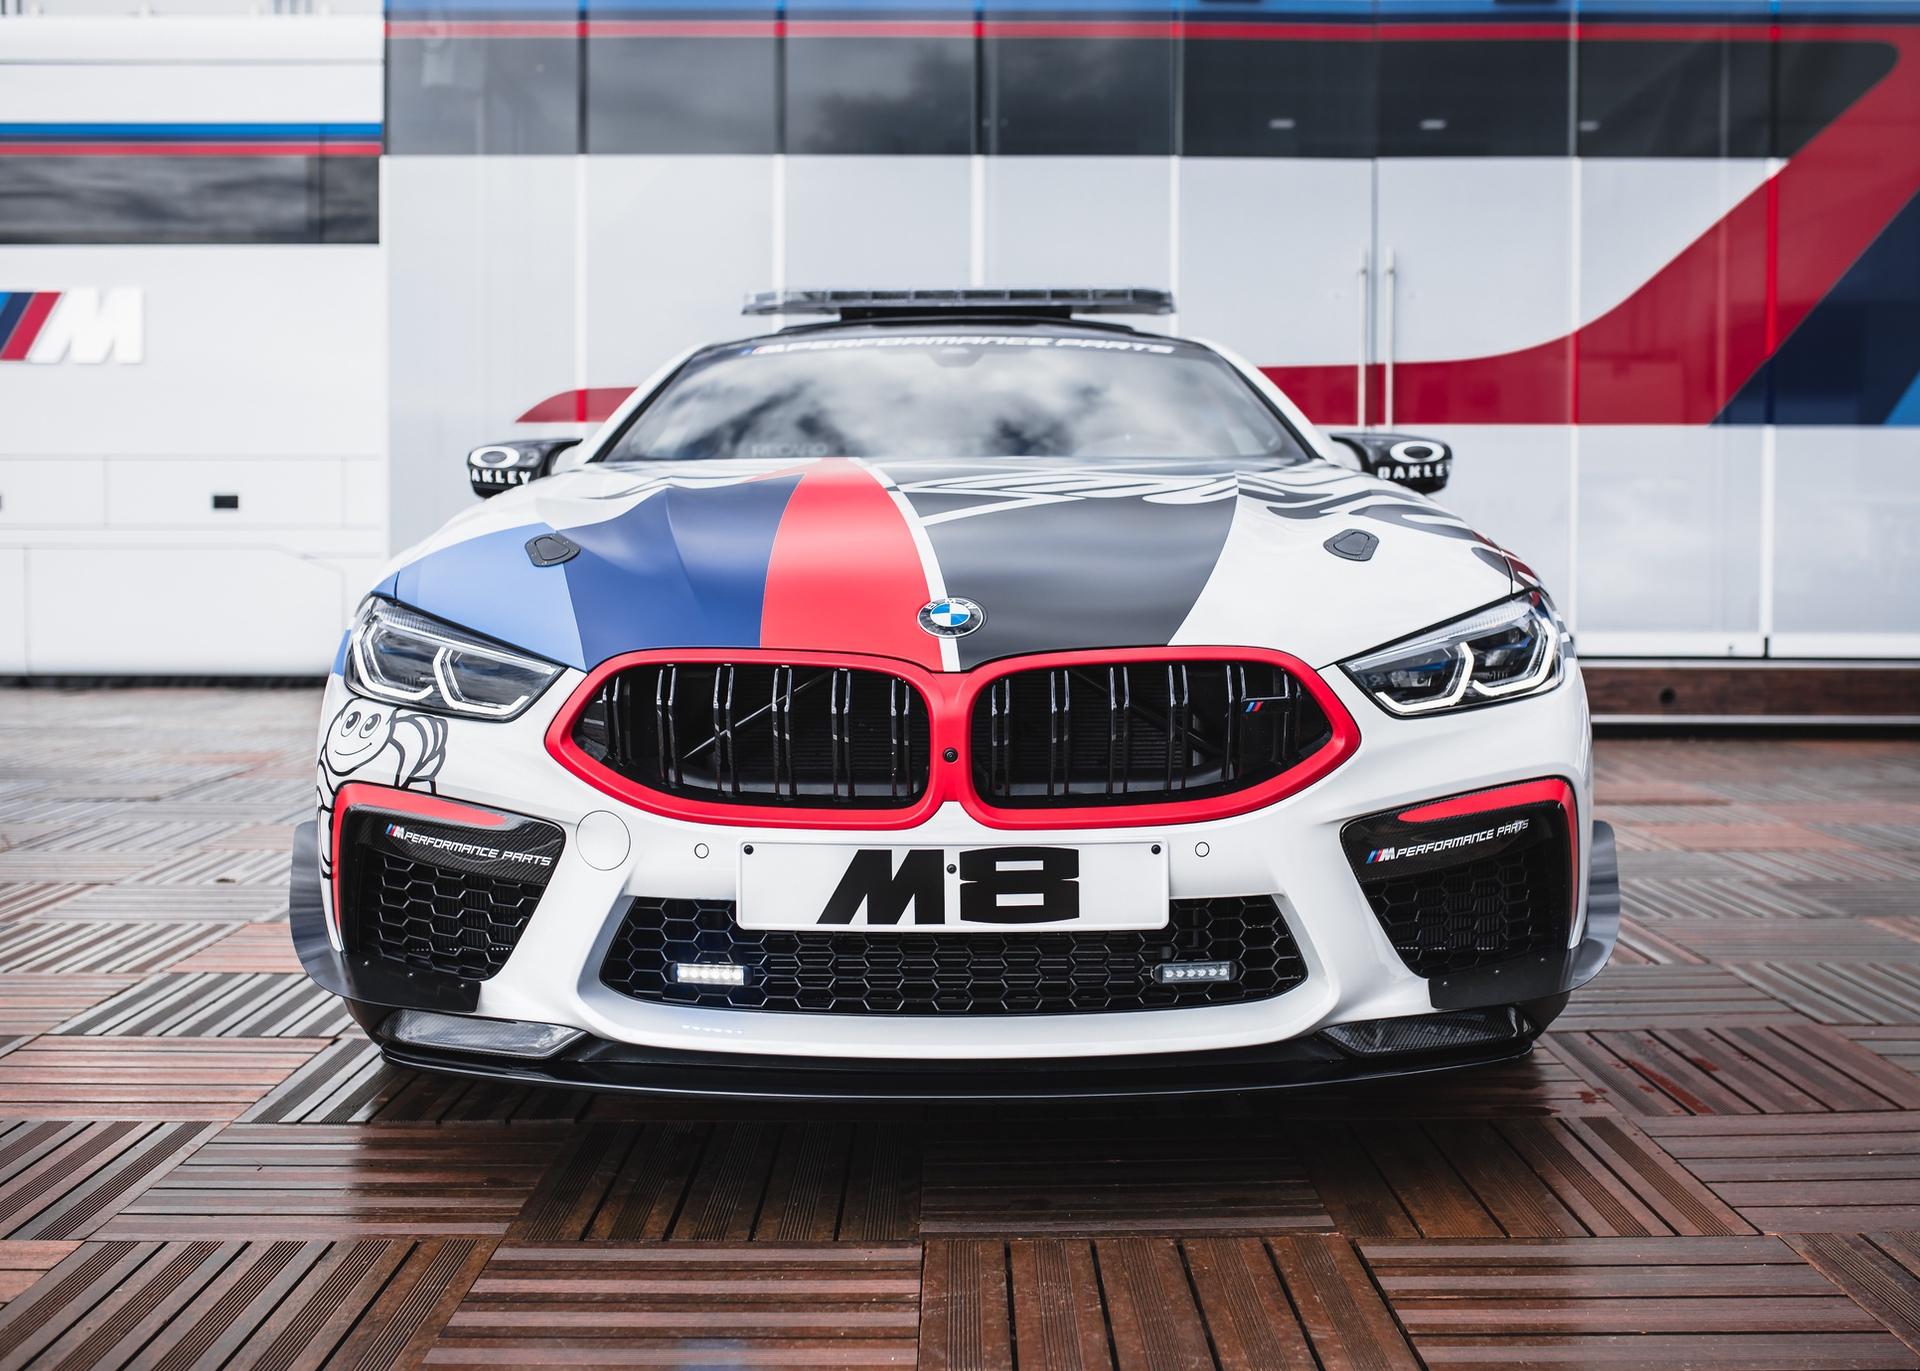 BMW_M8_MotoGP_Safety_Car_0046